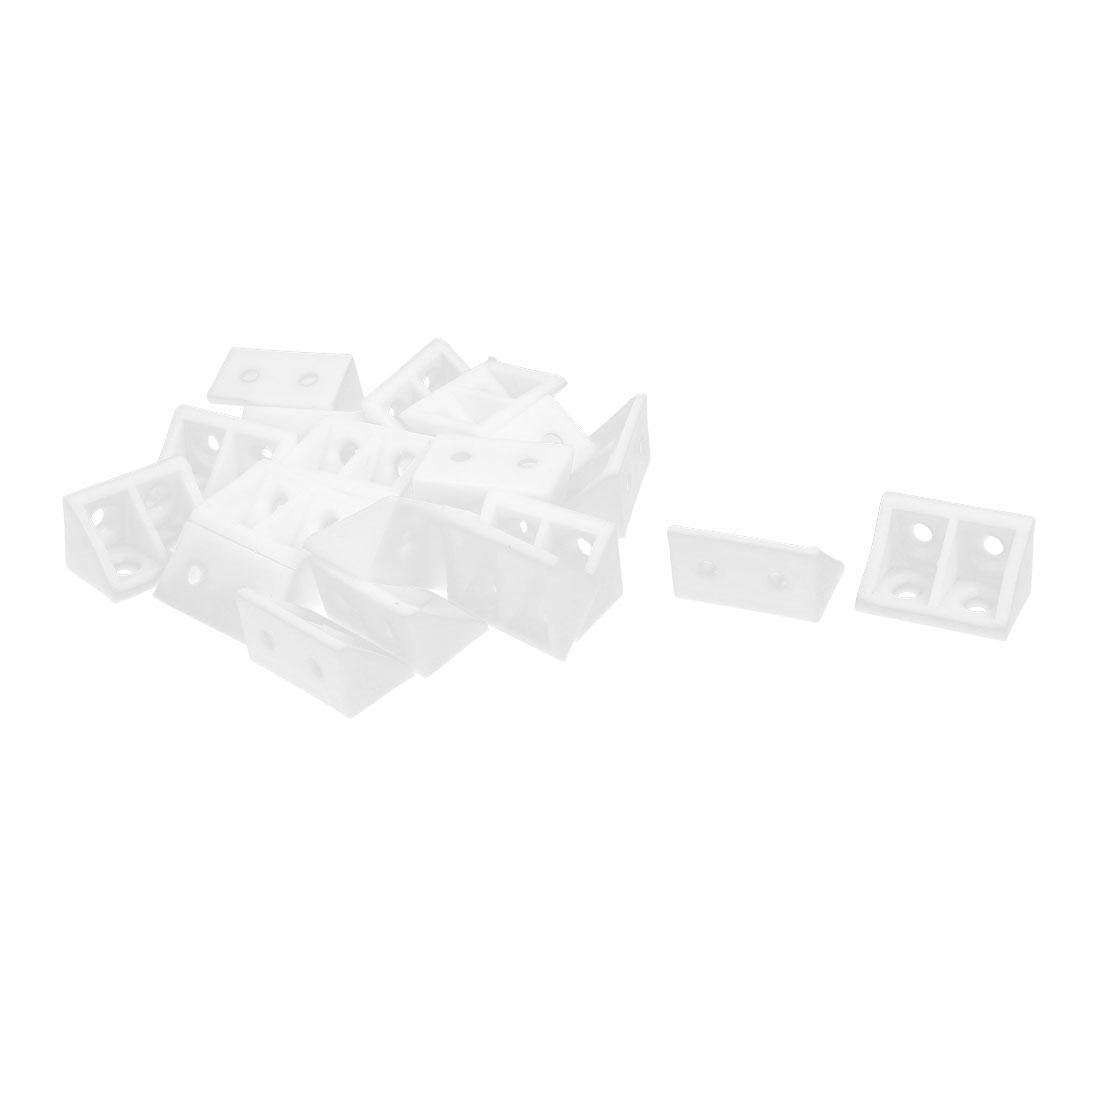 Closet Cabinet Plastic 90 Degree Angle Corner Bracket 33x20x20mm 20pcs